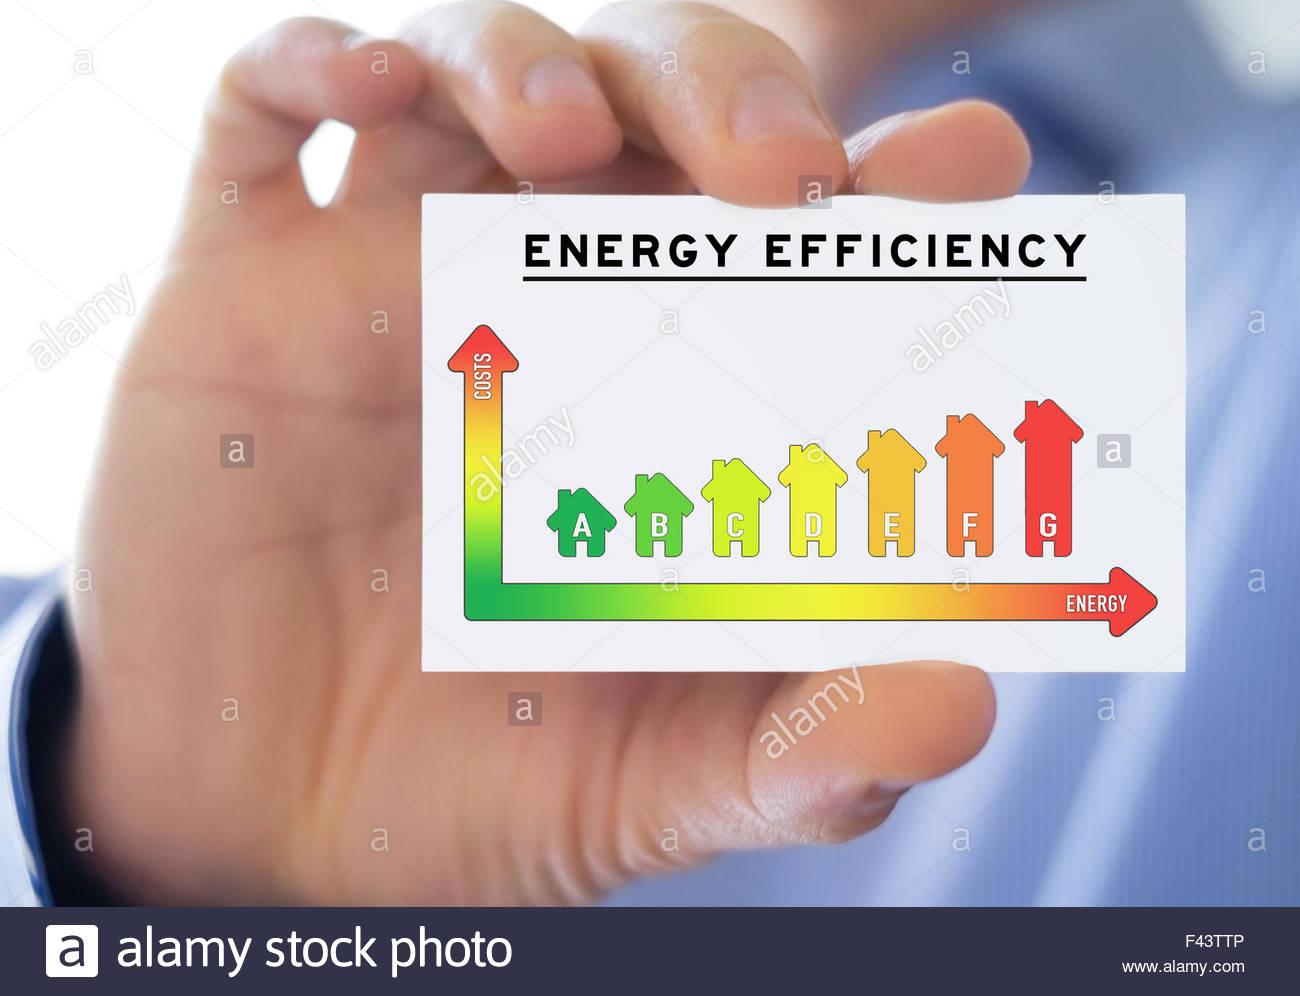 Energieeffizienz - Visitenkarte Stockbild